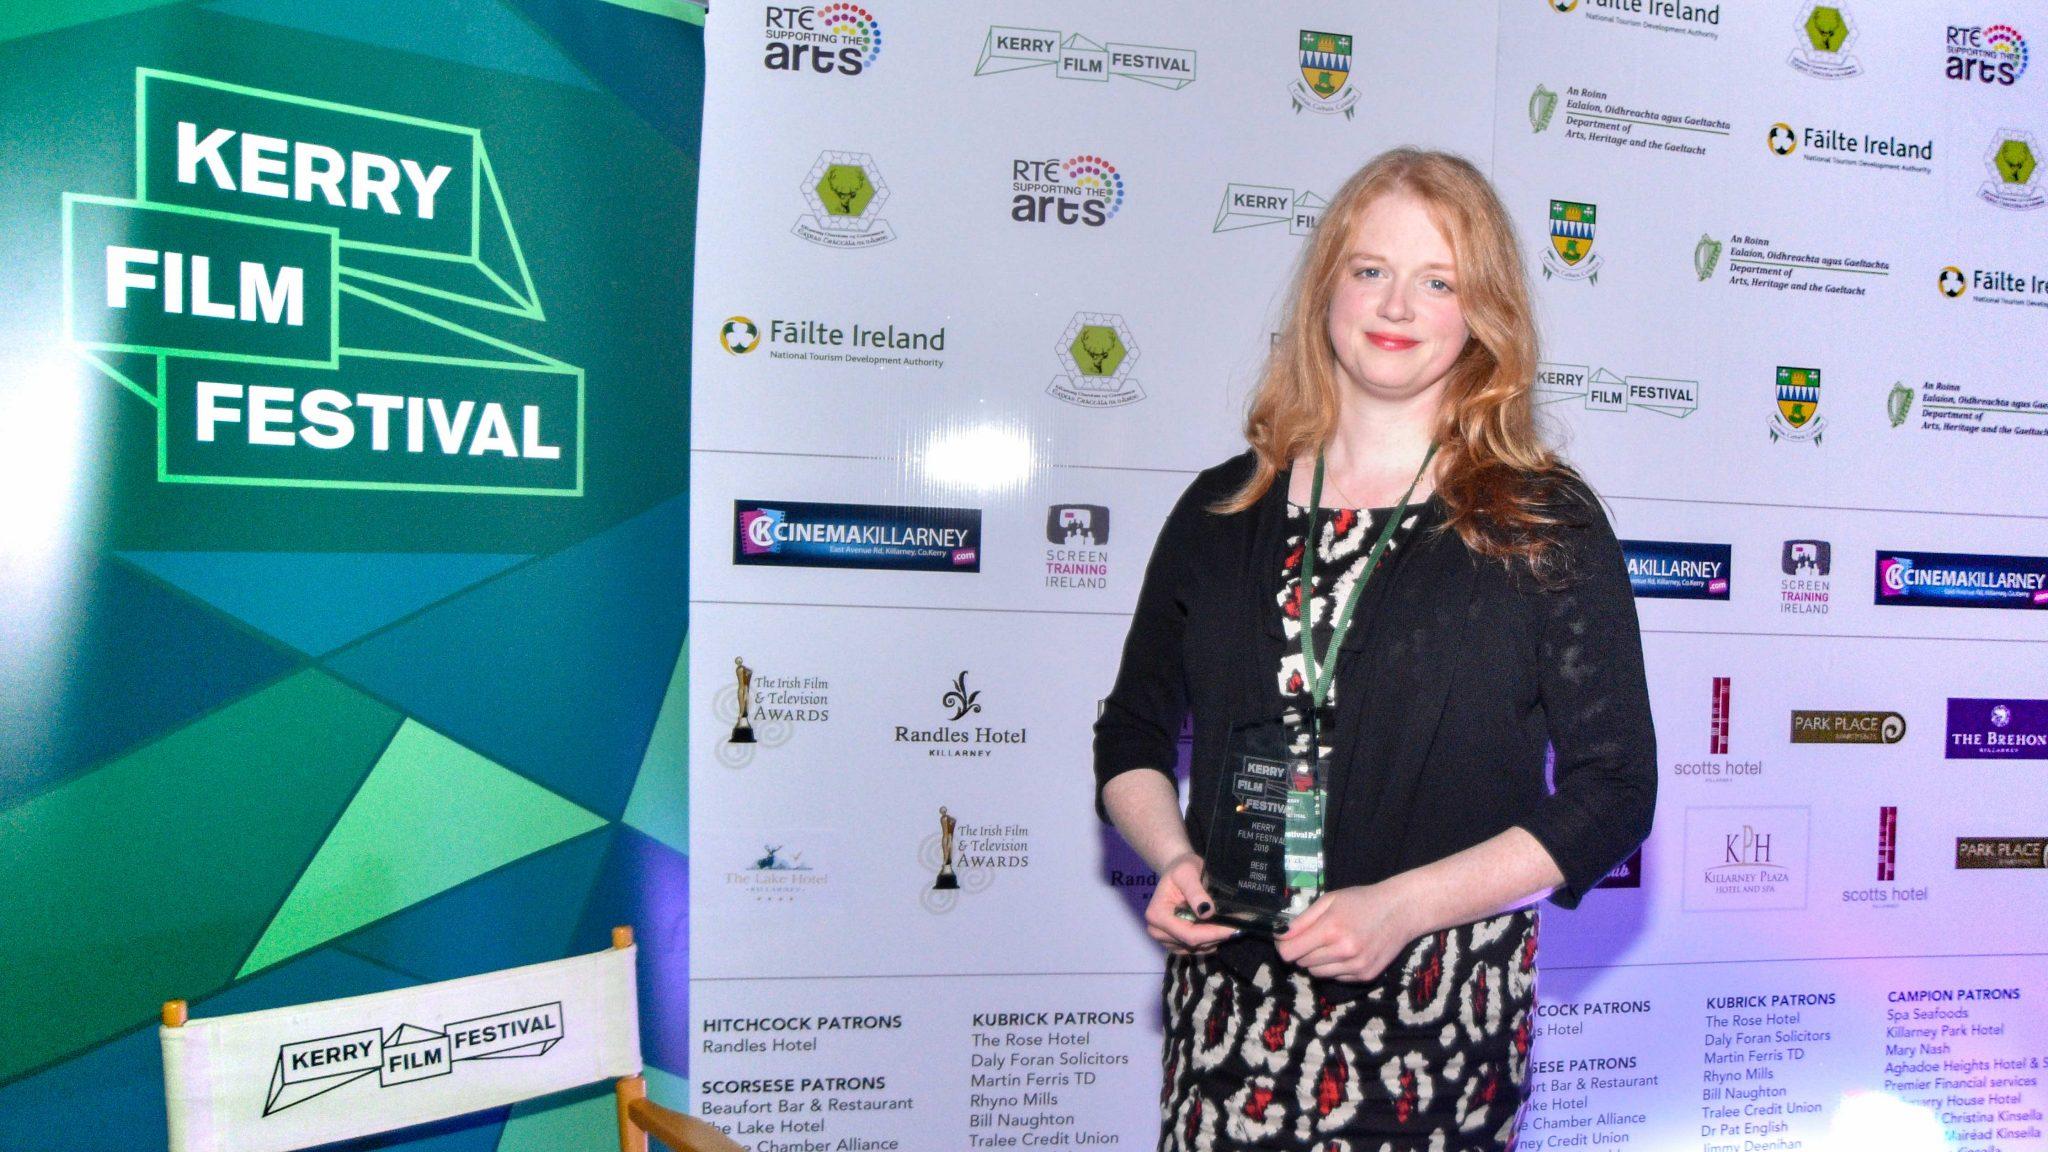 Kerry Film Festival 2016